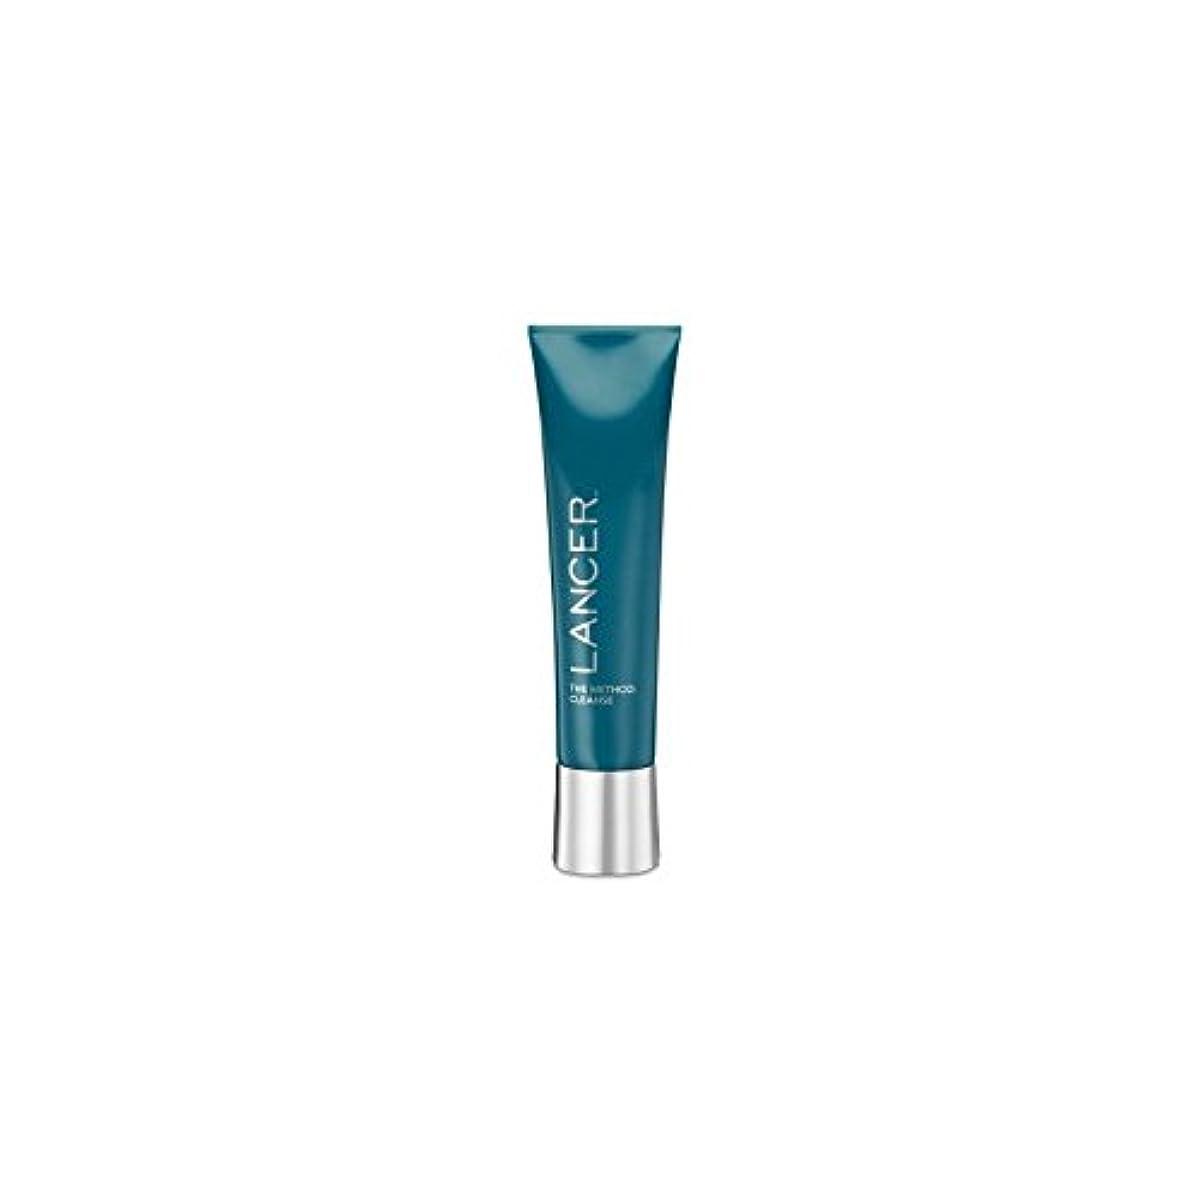 Lancer Skincare The Method: Cleanser (120ml) (Pack of 6) - クレンザー(120ミリリットル):ランサーは、メソッドをスキンケア x6 [並行輸入品]